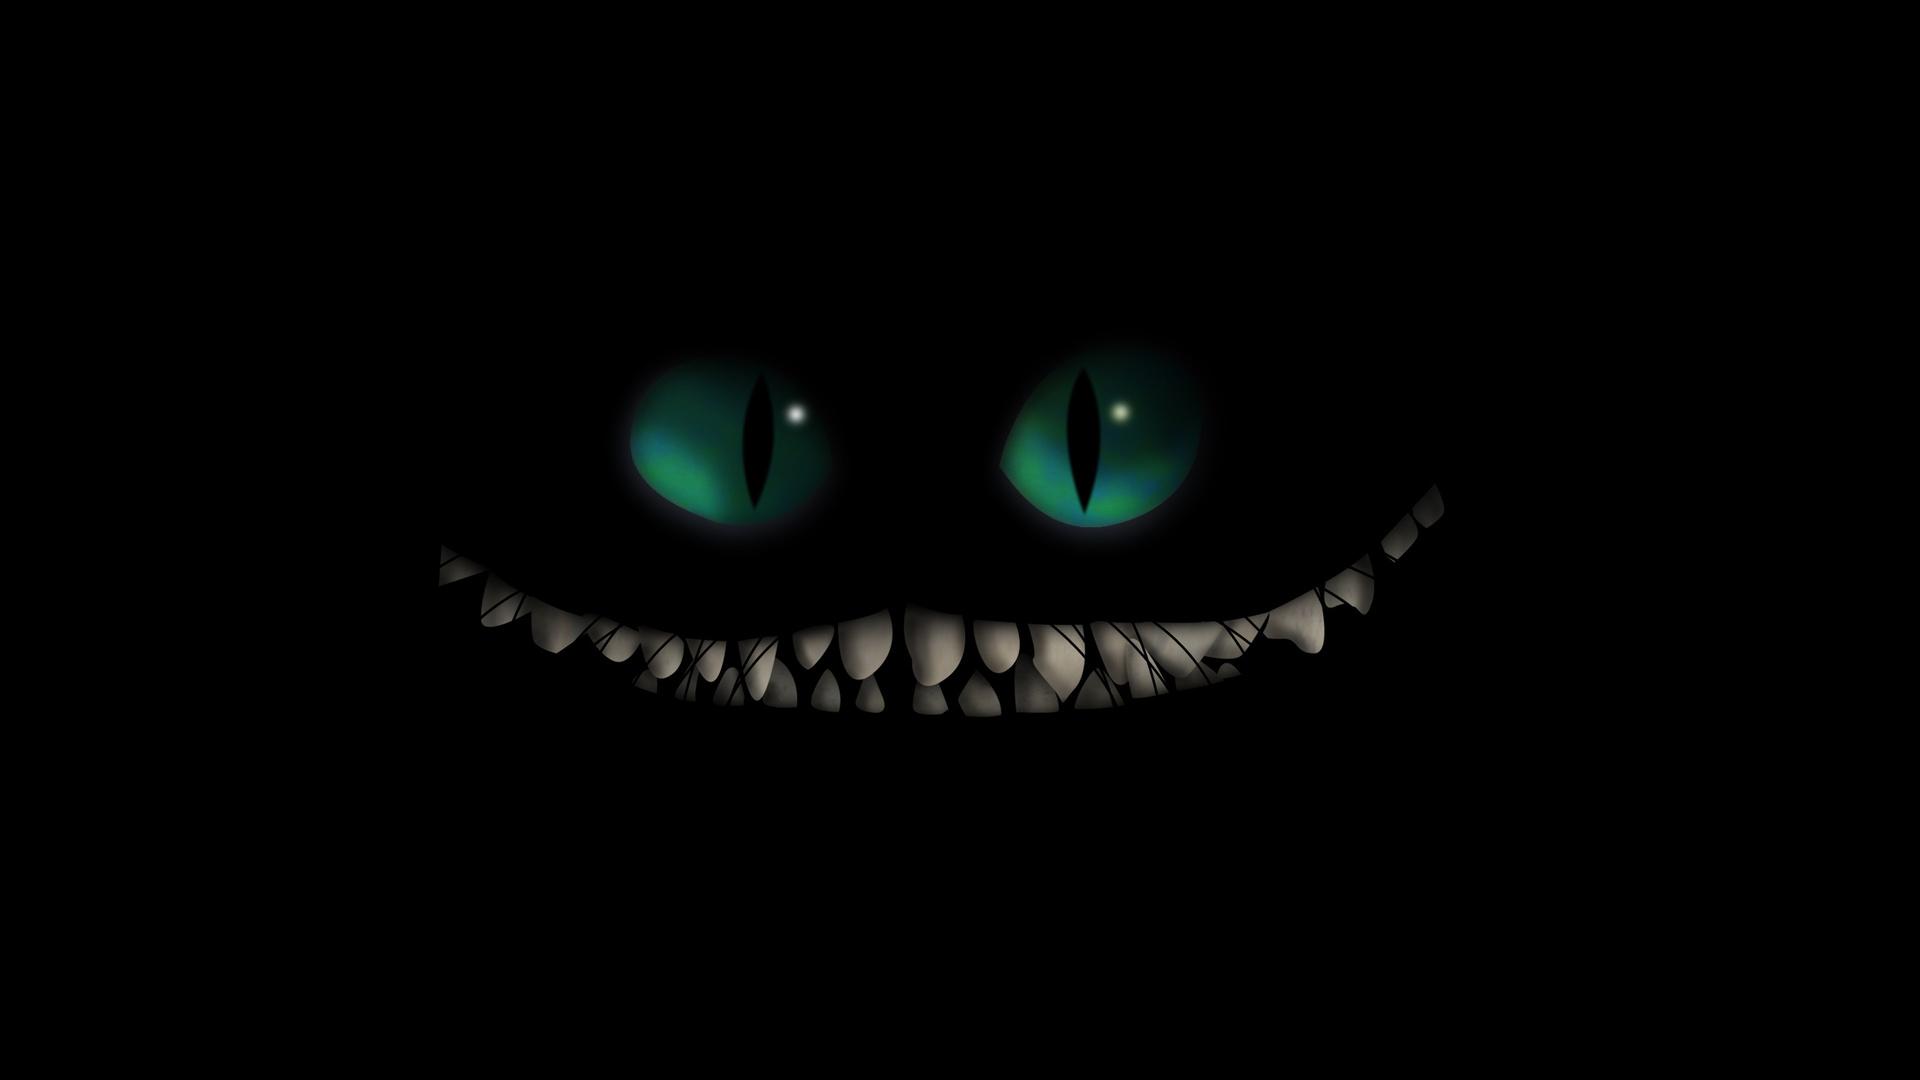 Чеширского кота улыбка чеширского